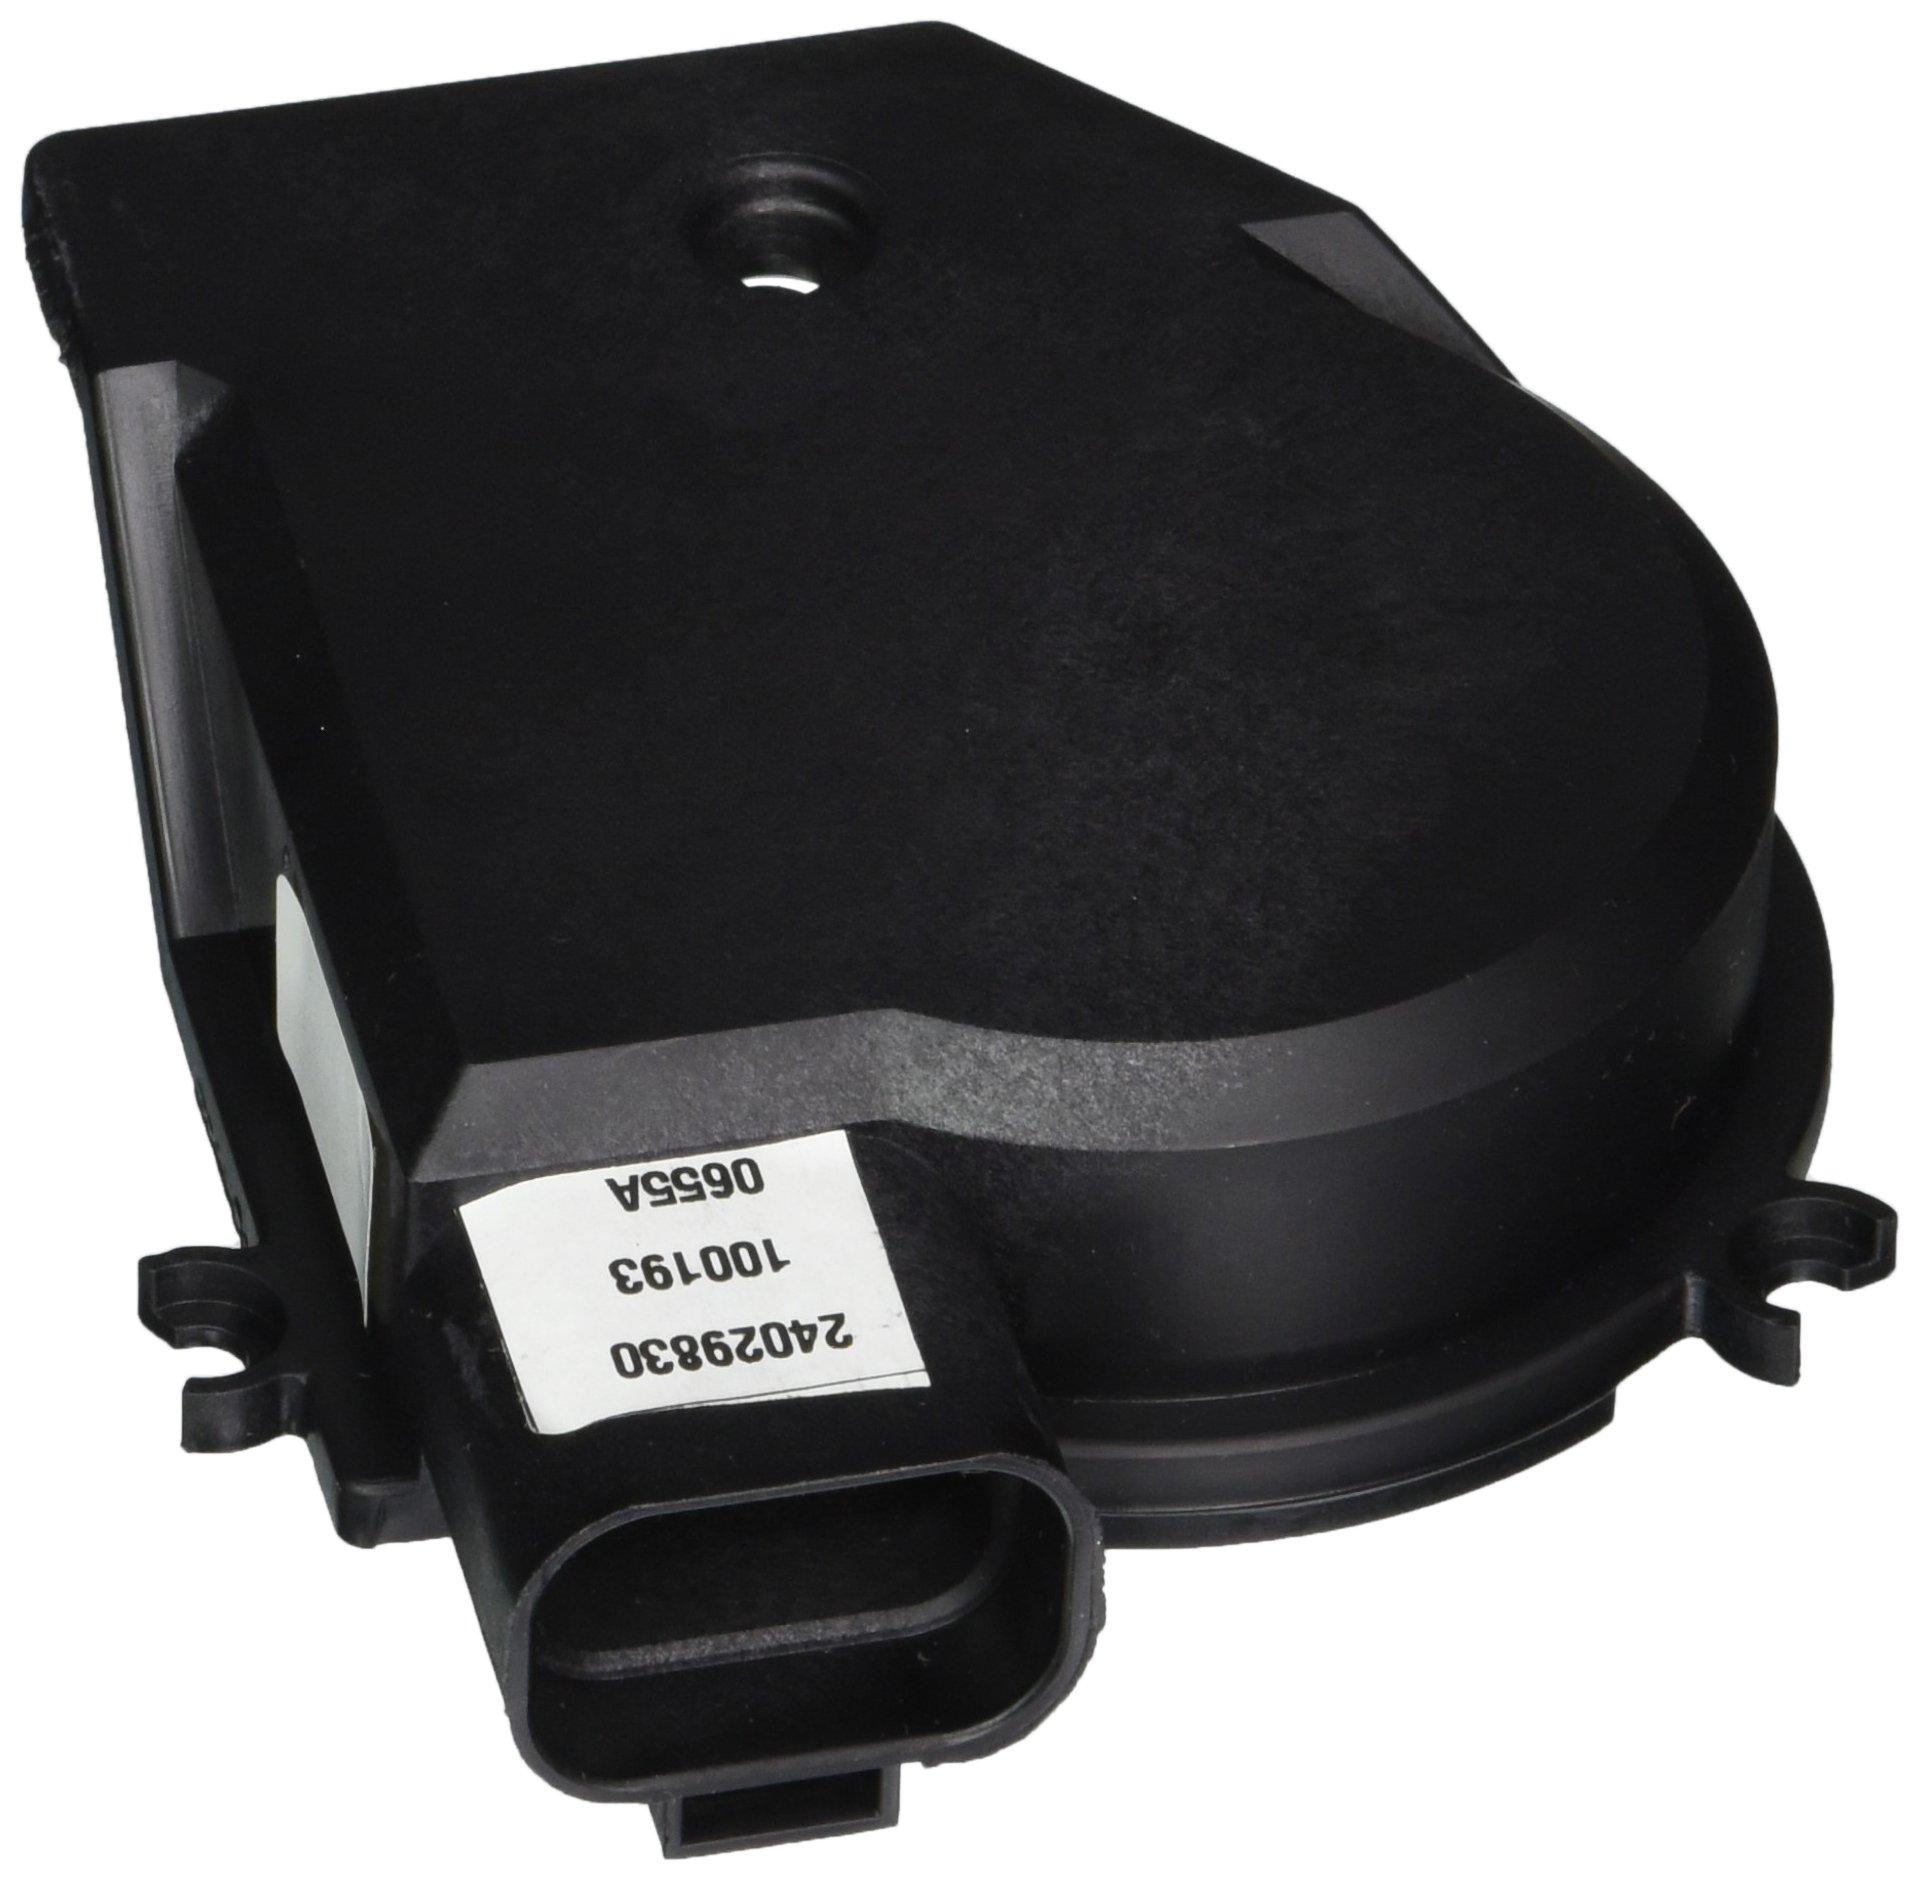 Genuine GM 88958136 Windshield Wiper Motor Cover Kit